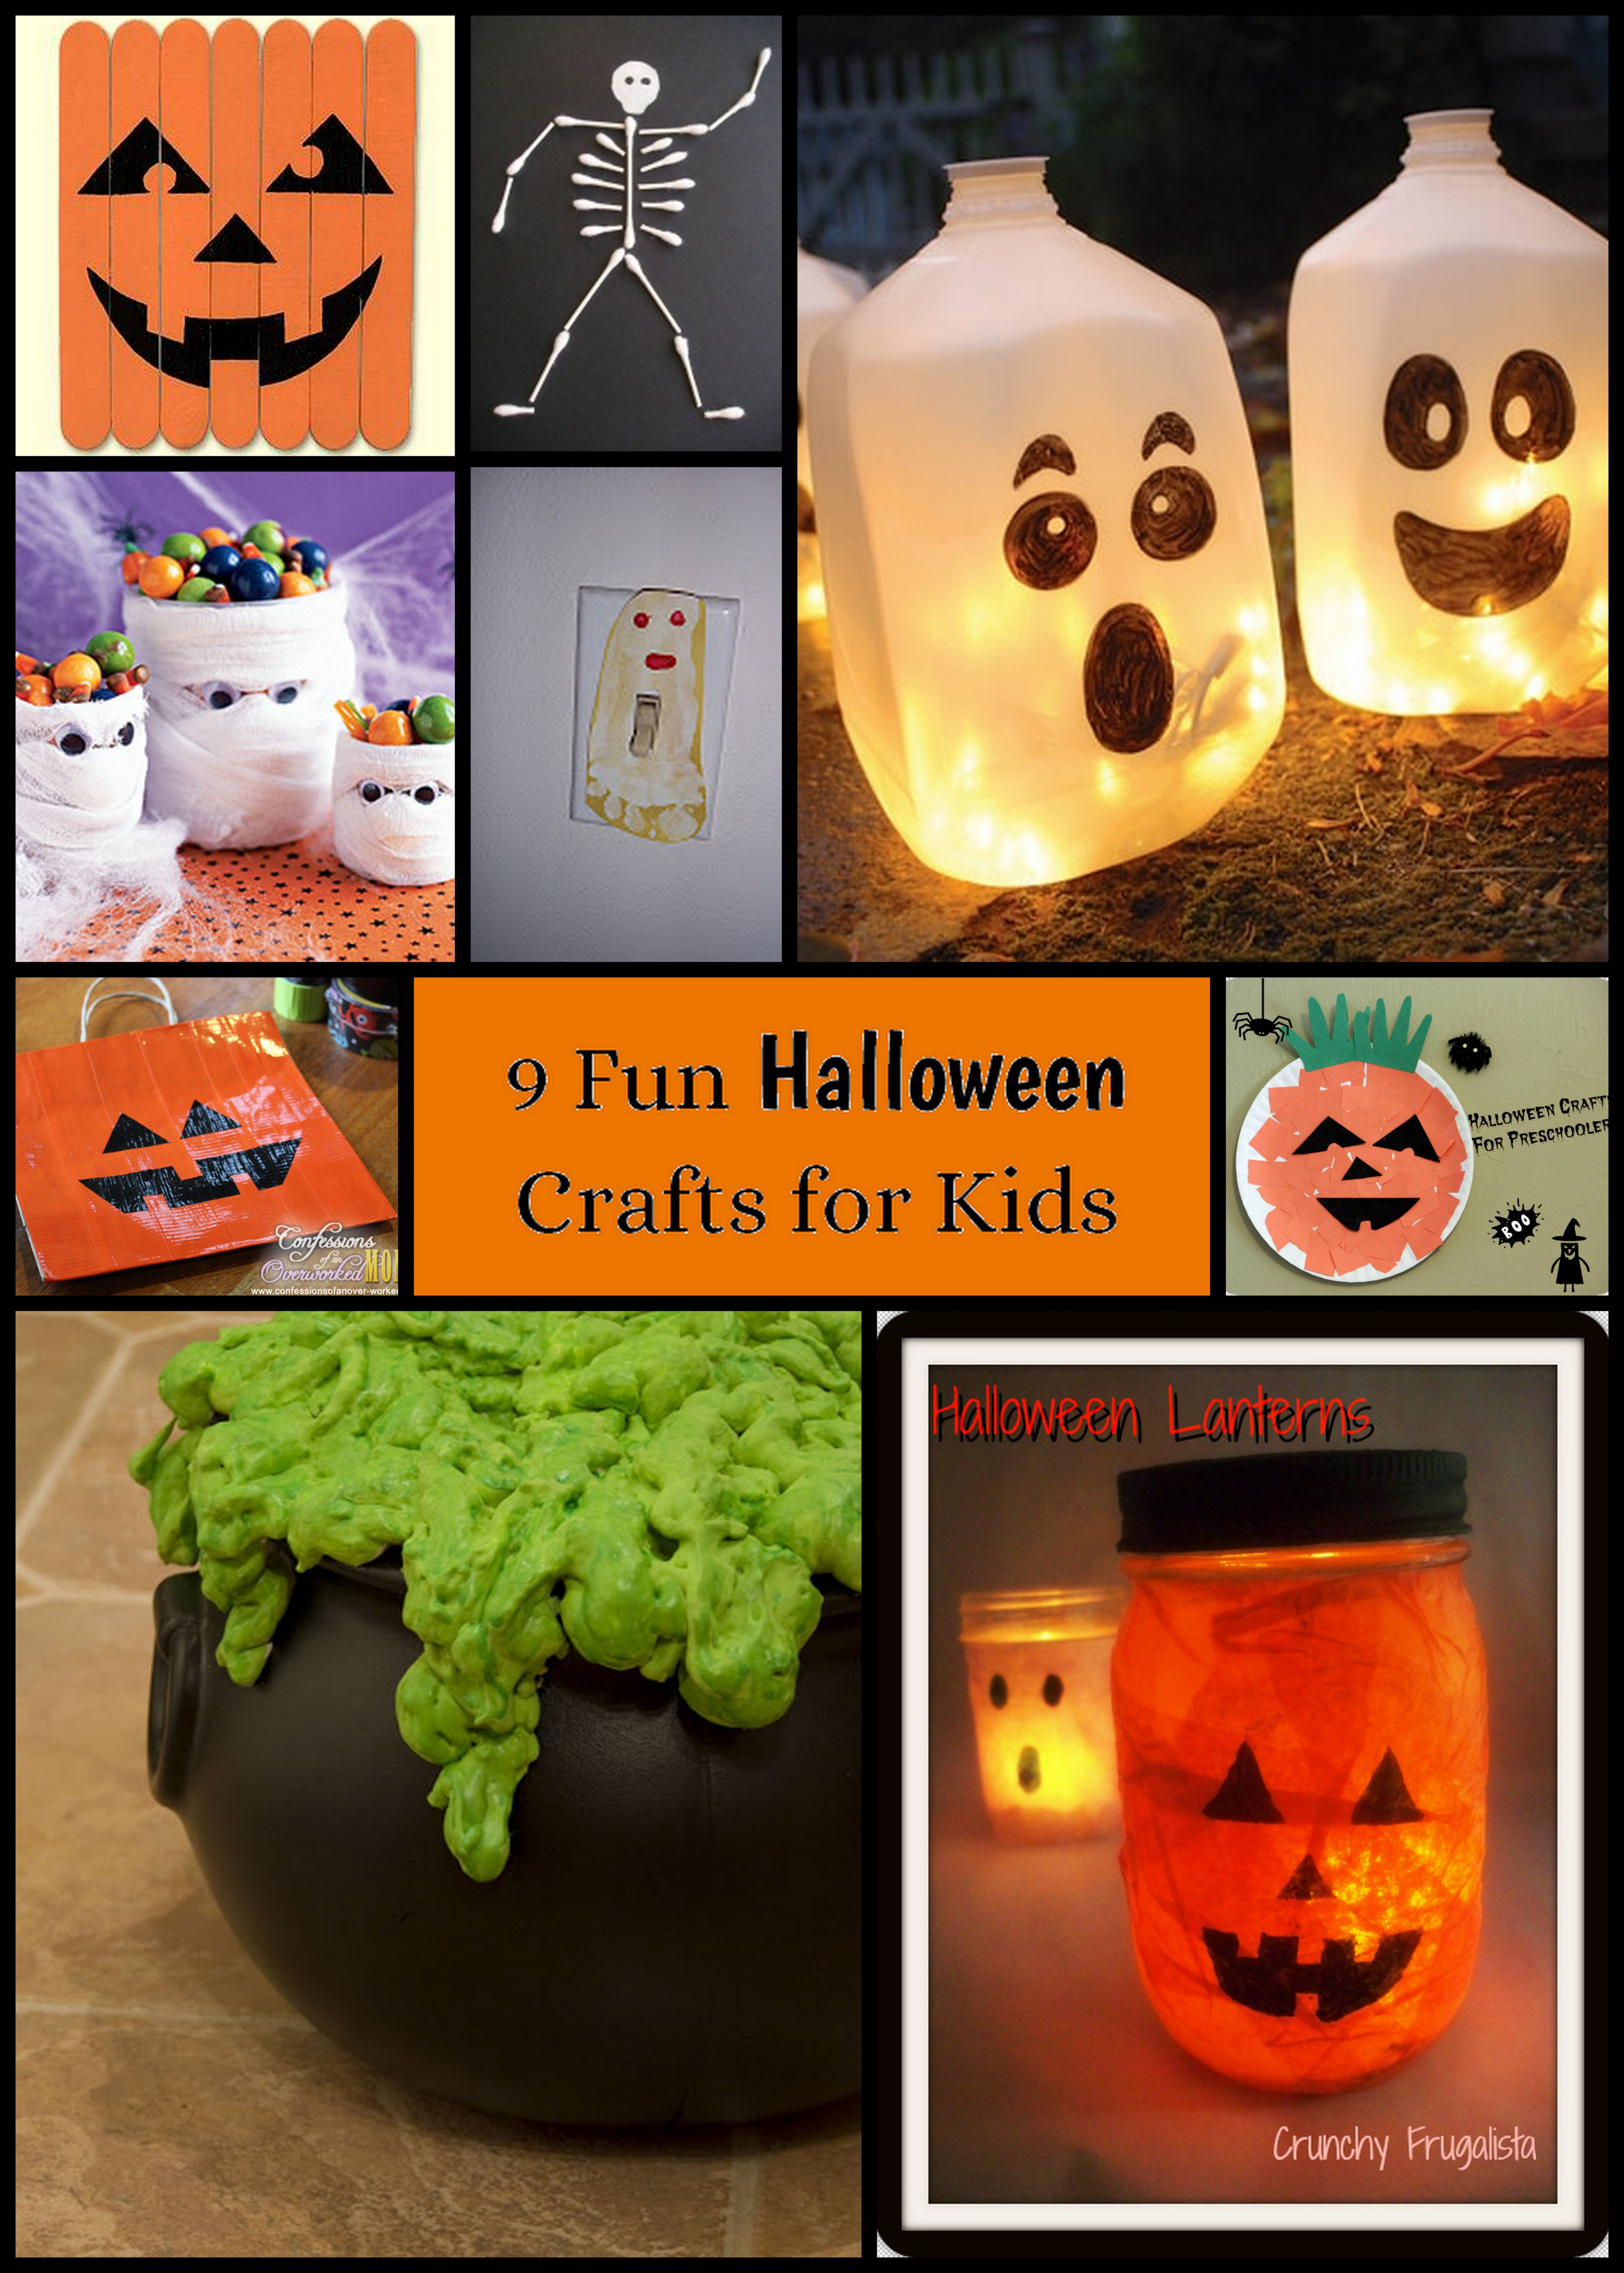 18 Fun Halloween Crafts for Kids